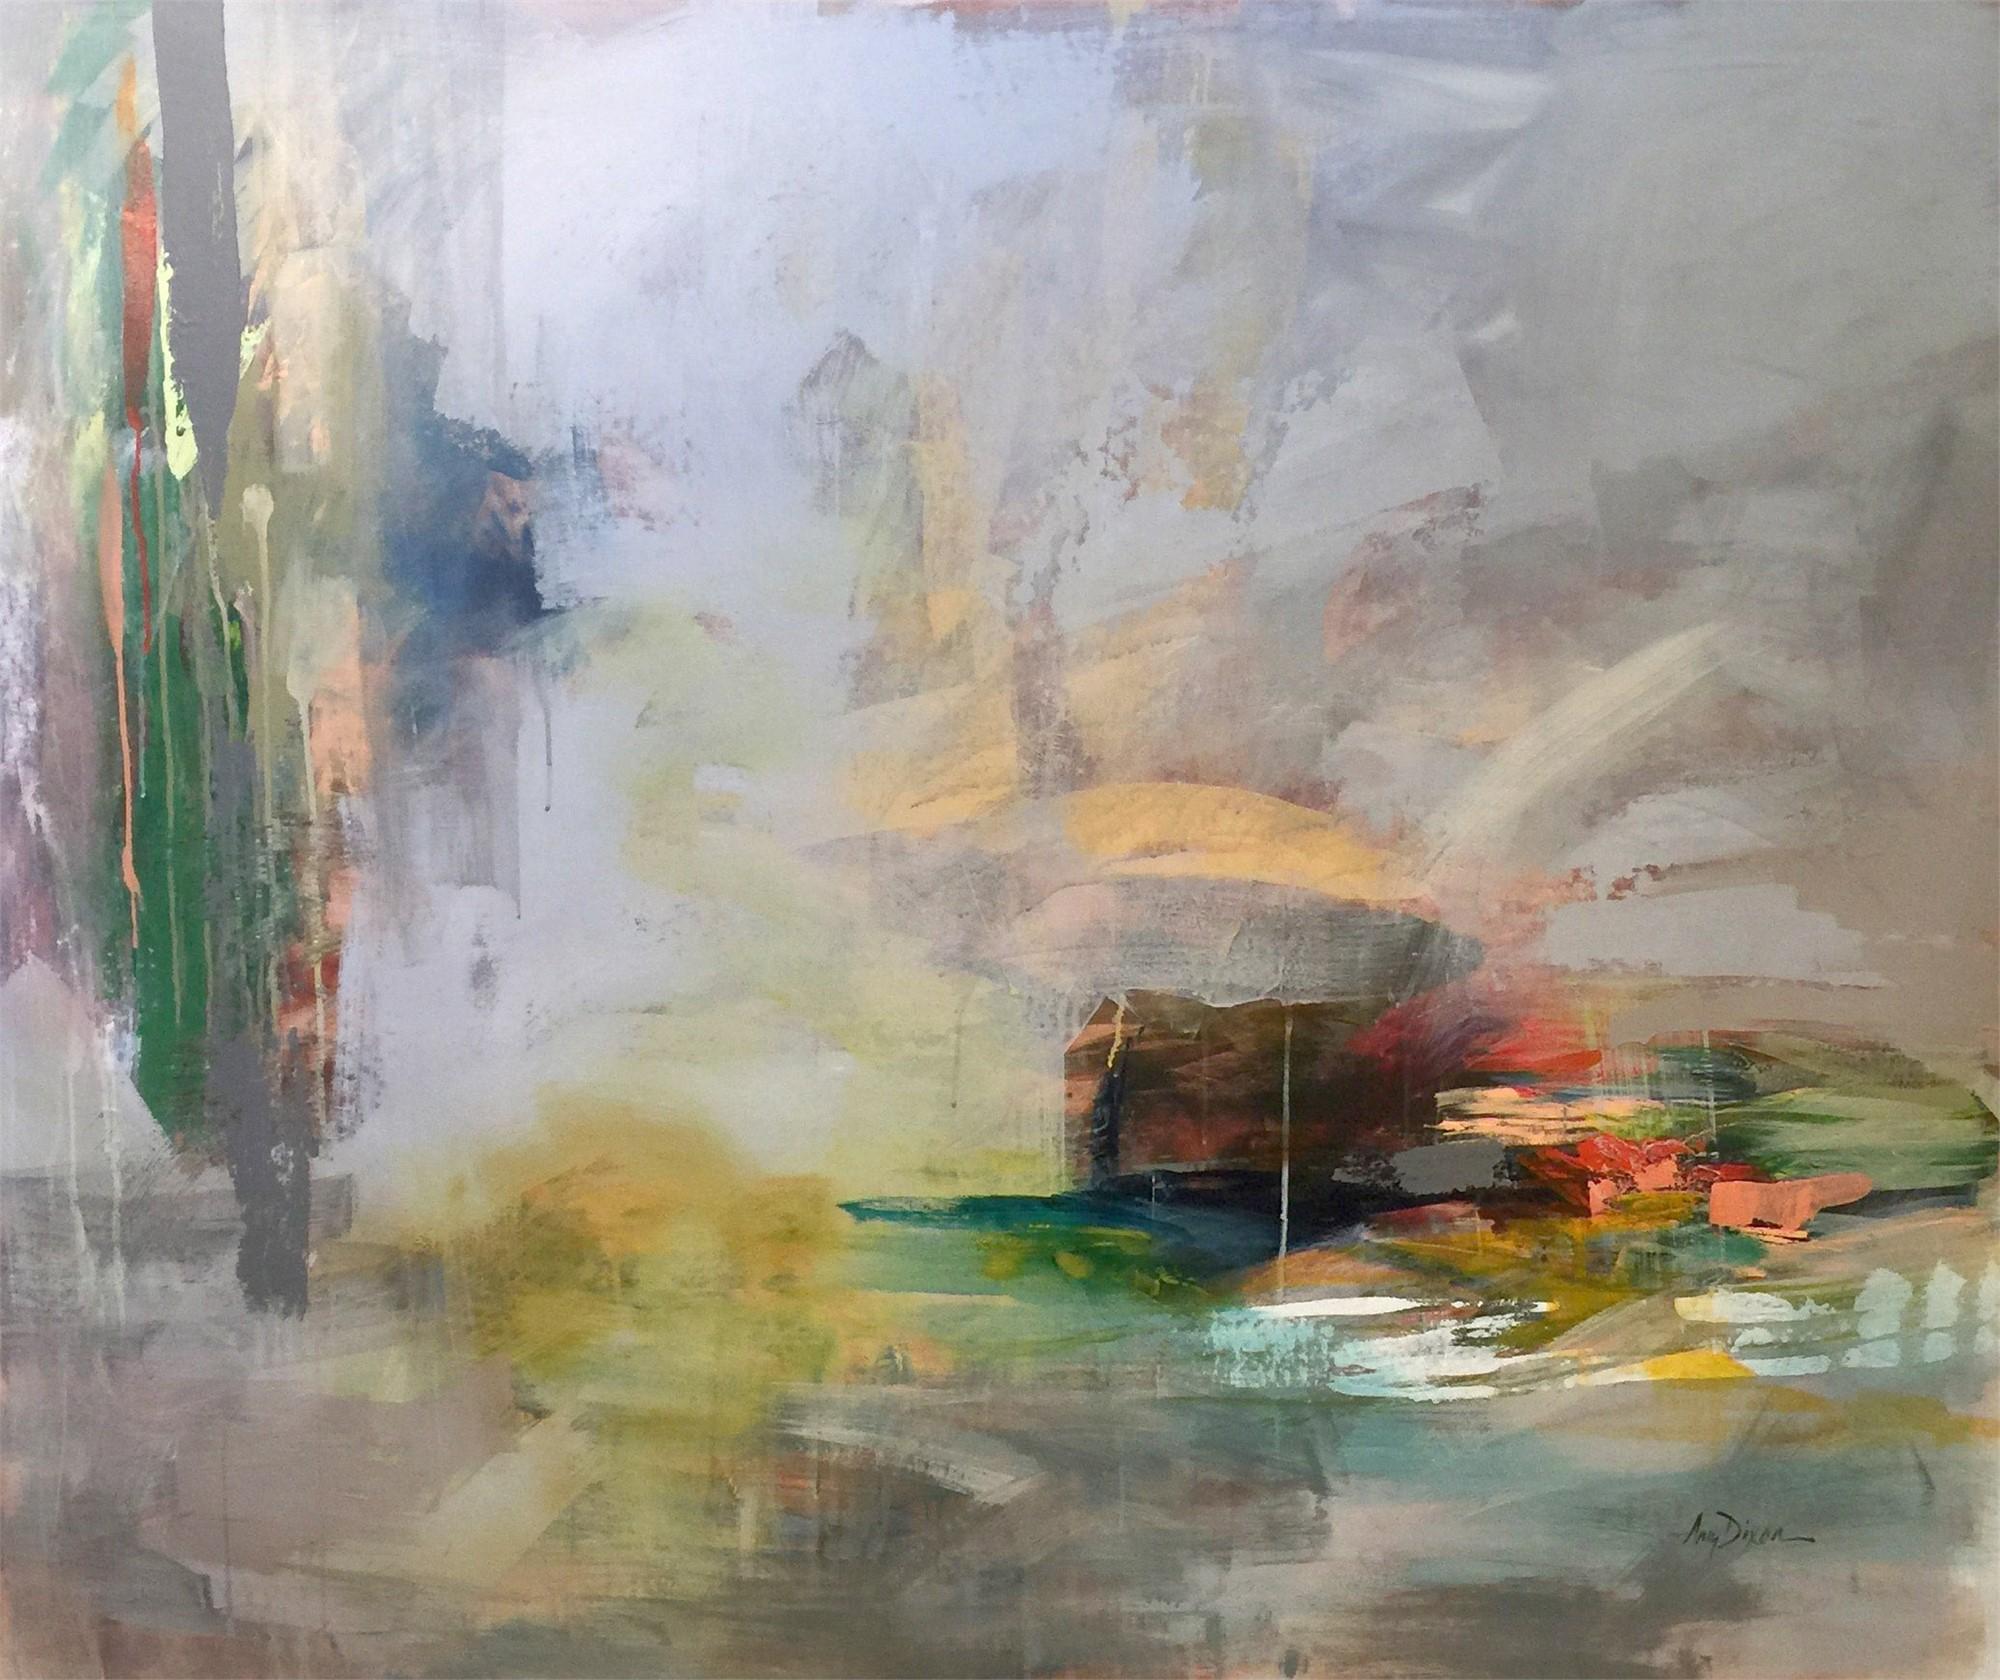 Landfall by Amy Dixon